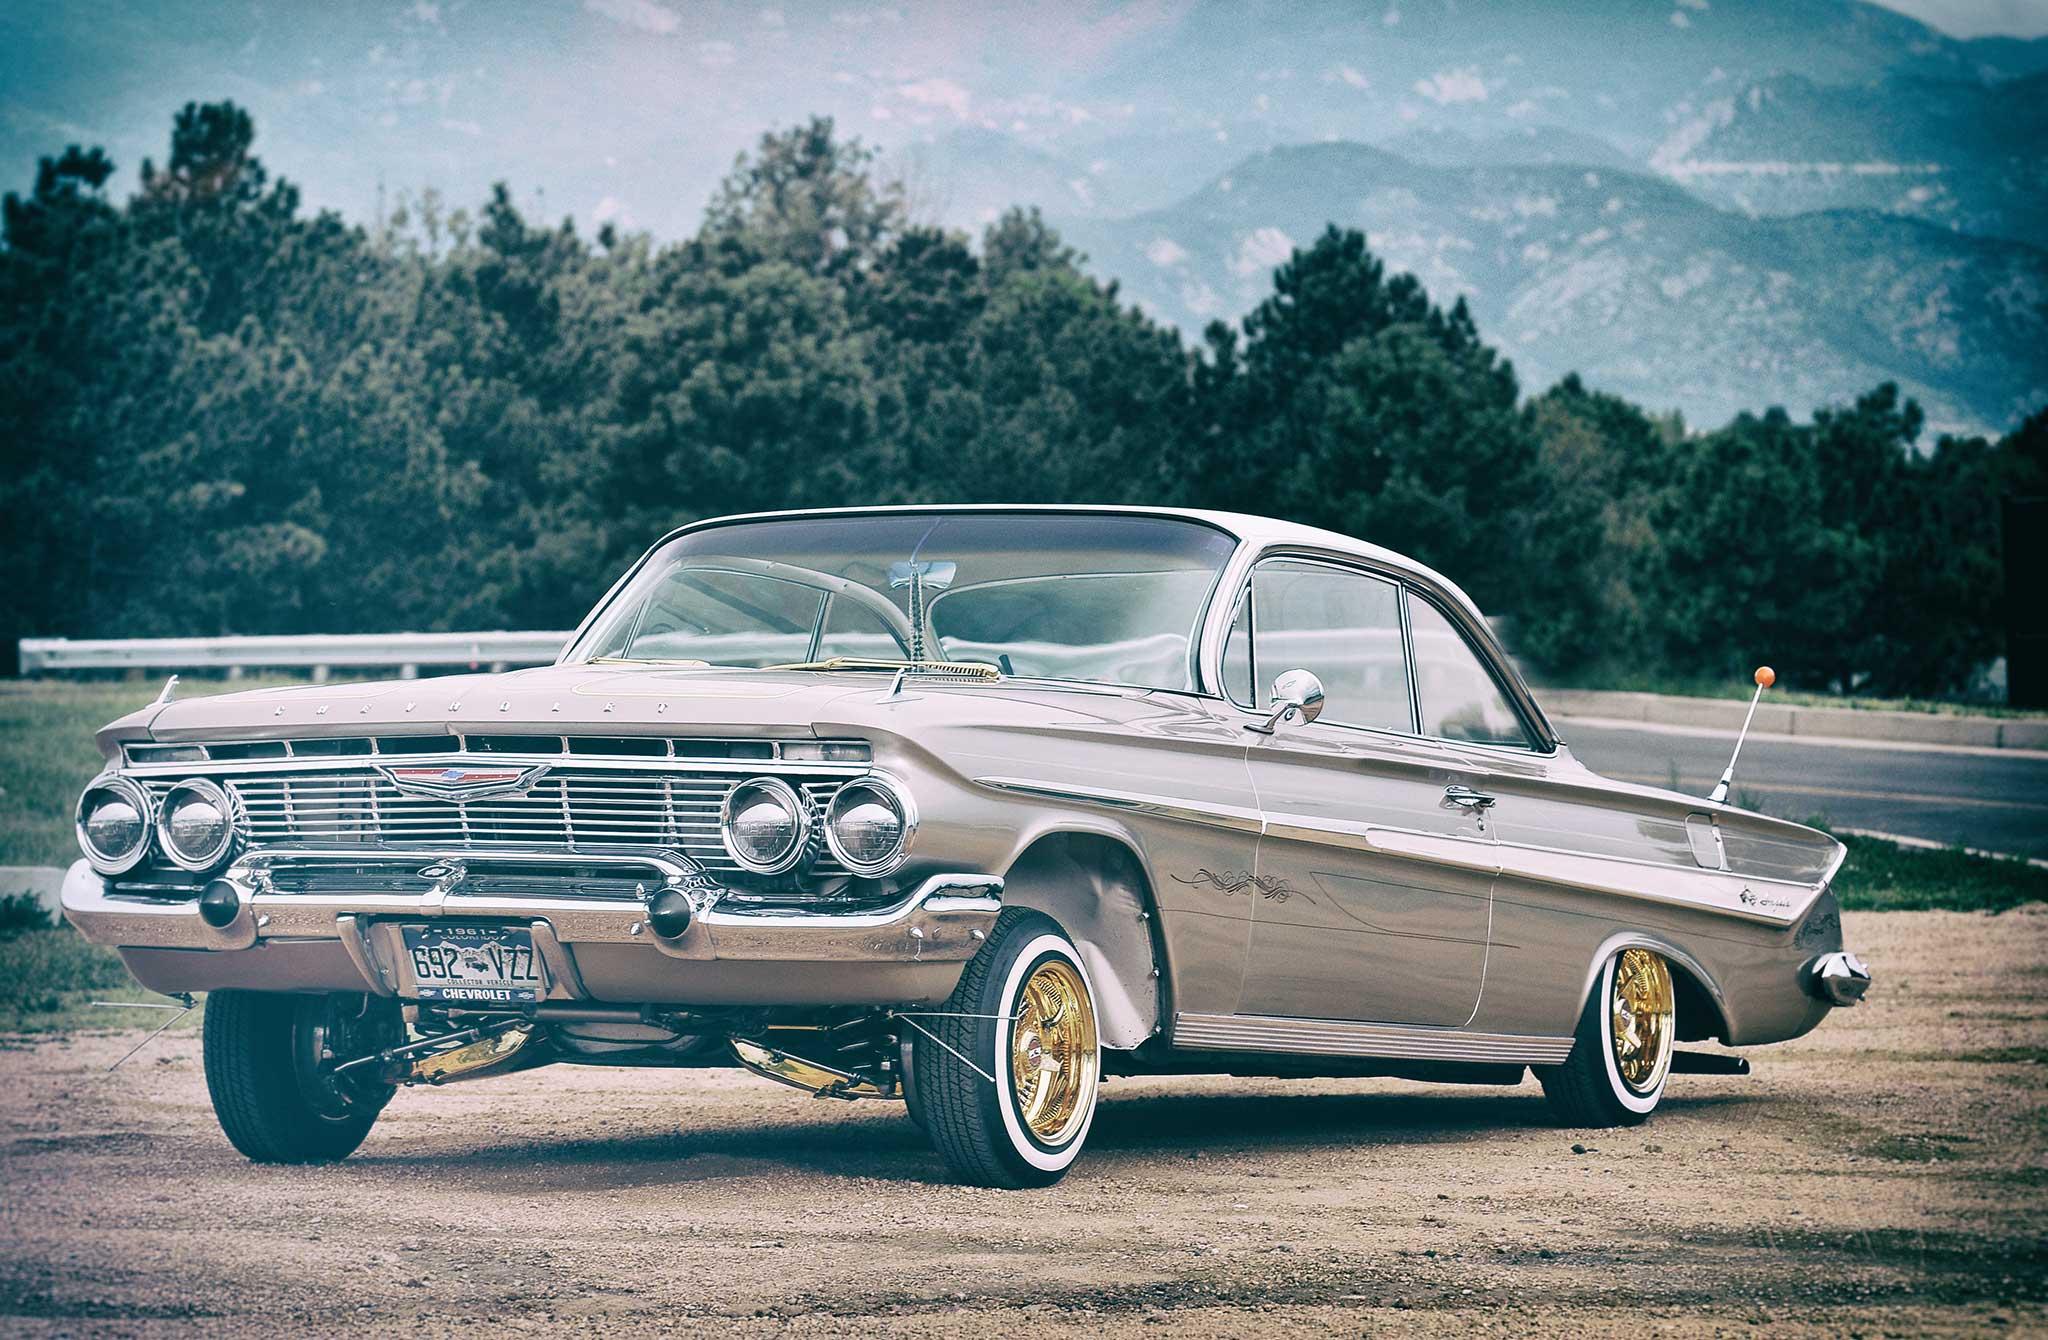 1961 chevrolet impala precious metals lowrider. Black Bedroom Furniture Sets. Home Design Ideas